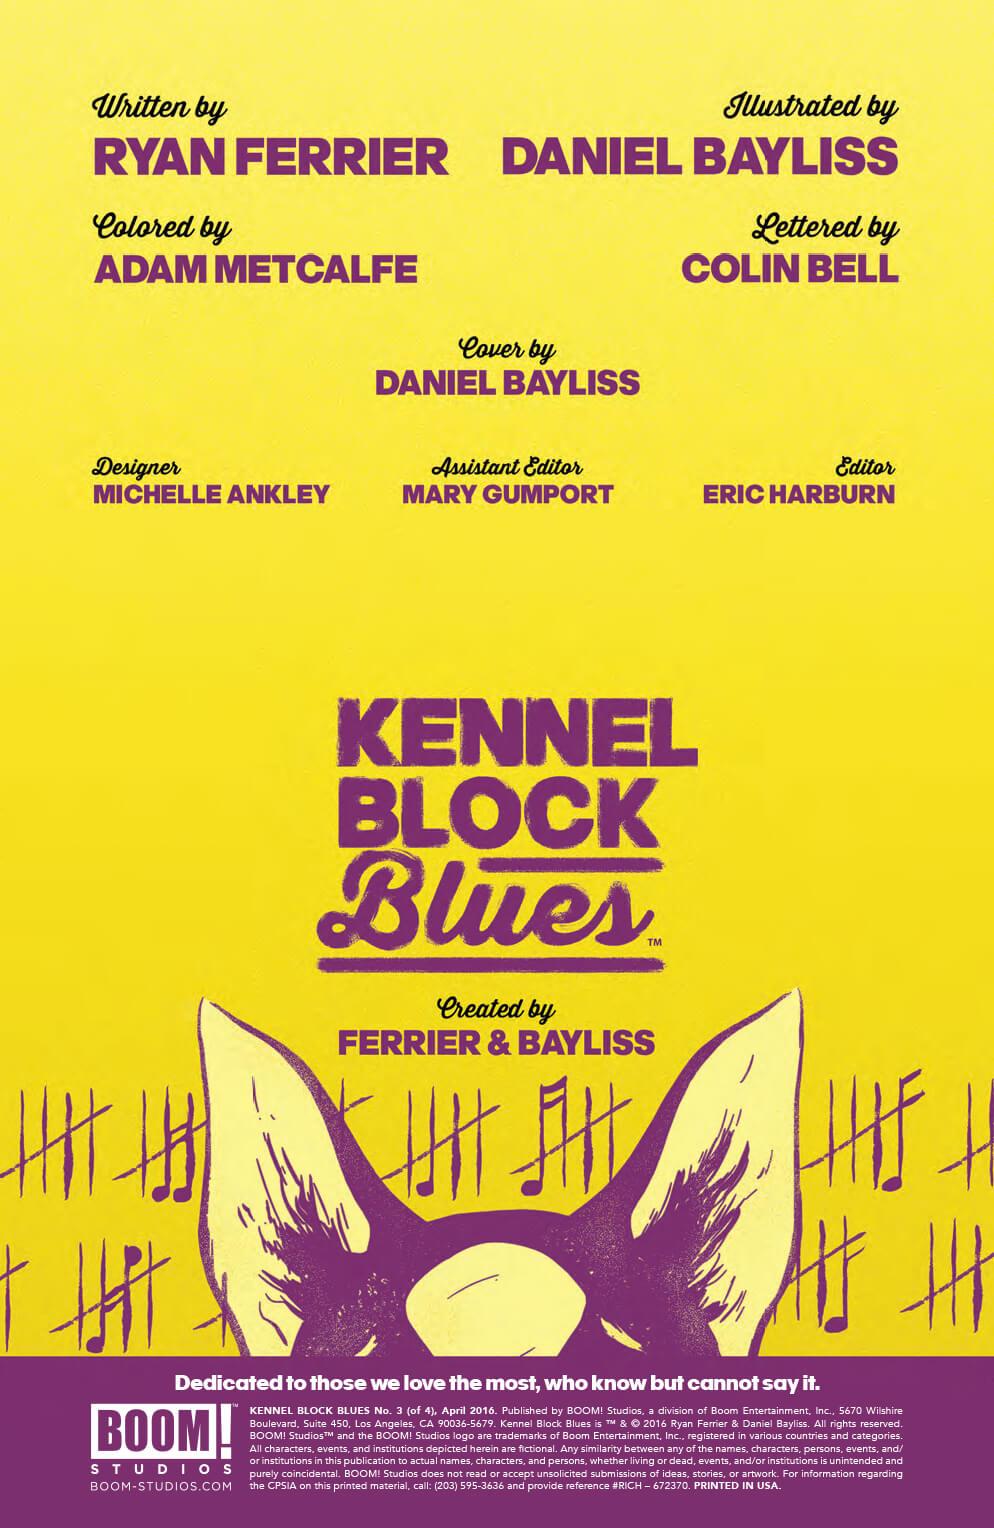 Kennel_Block_Blues_003_PRESS-2